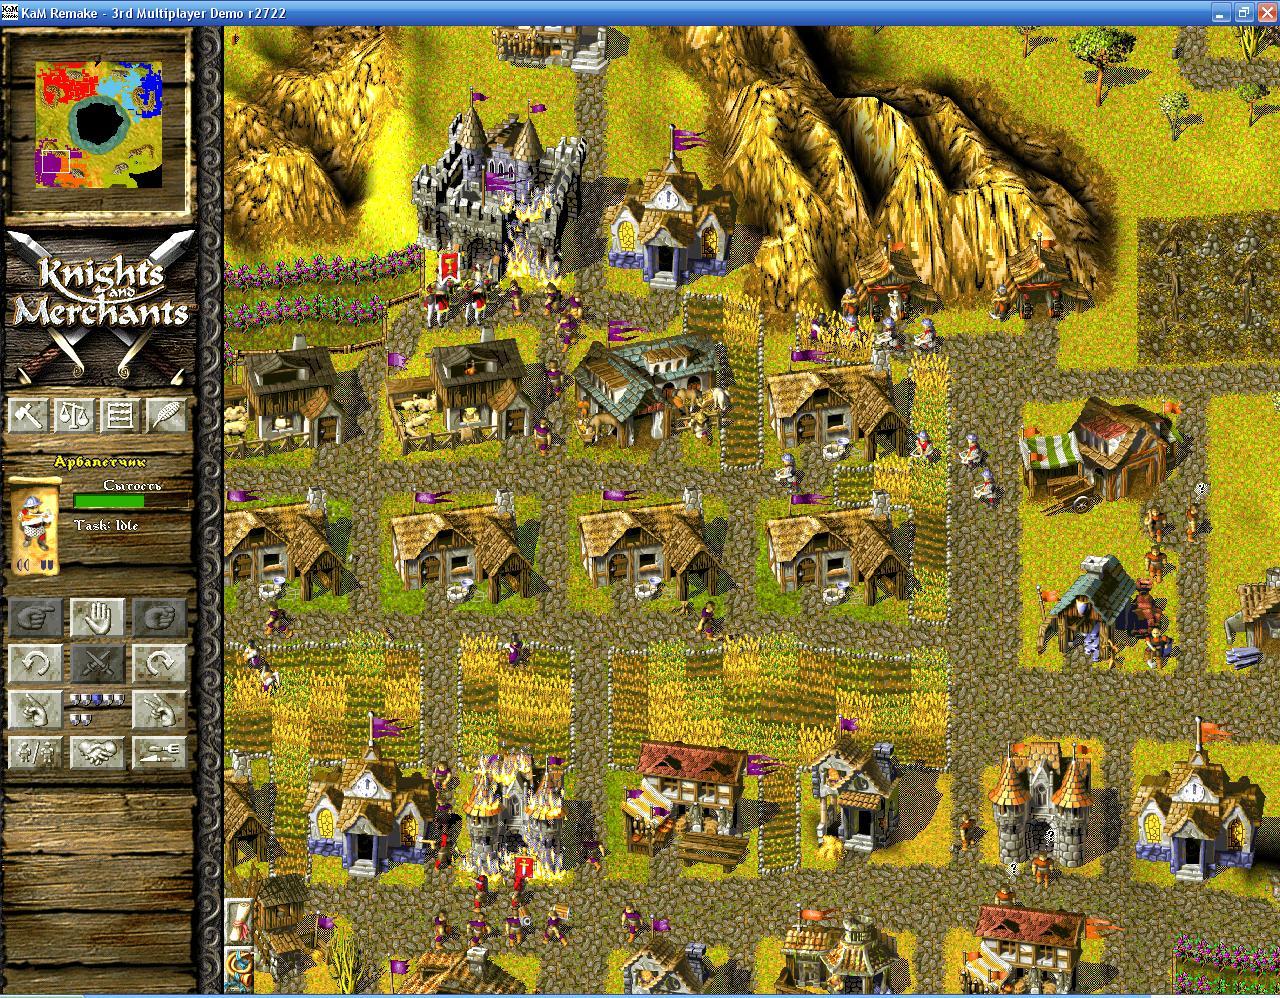 левин антивирус.JPG - Knights & Merchants: The Peasants Rebellion